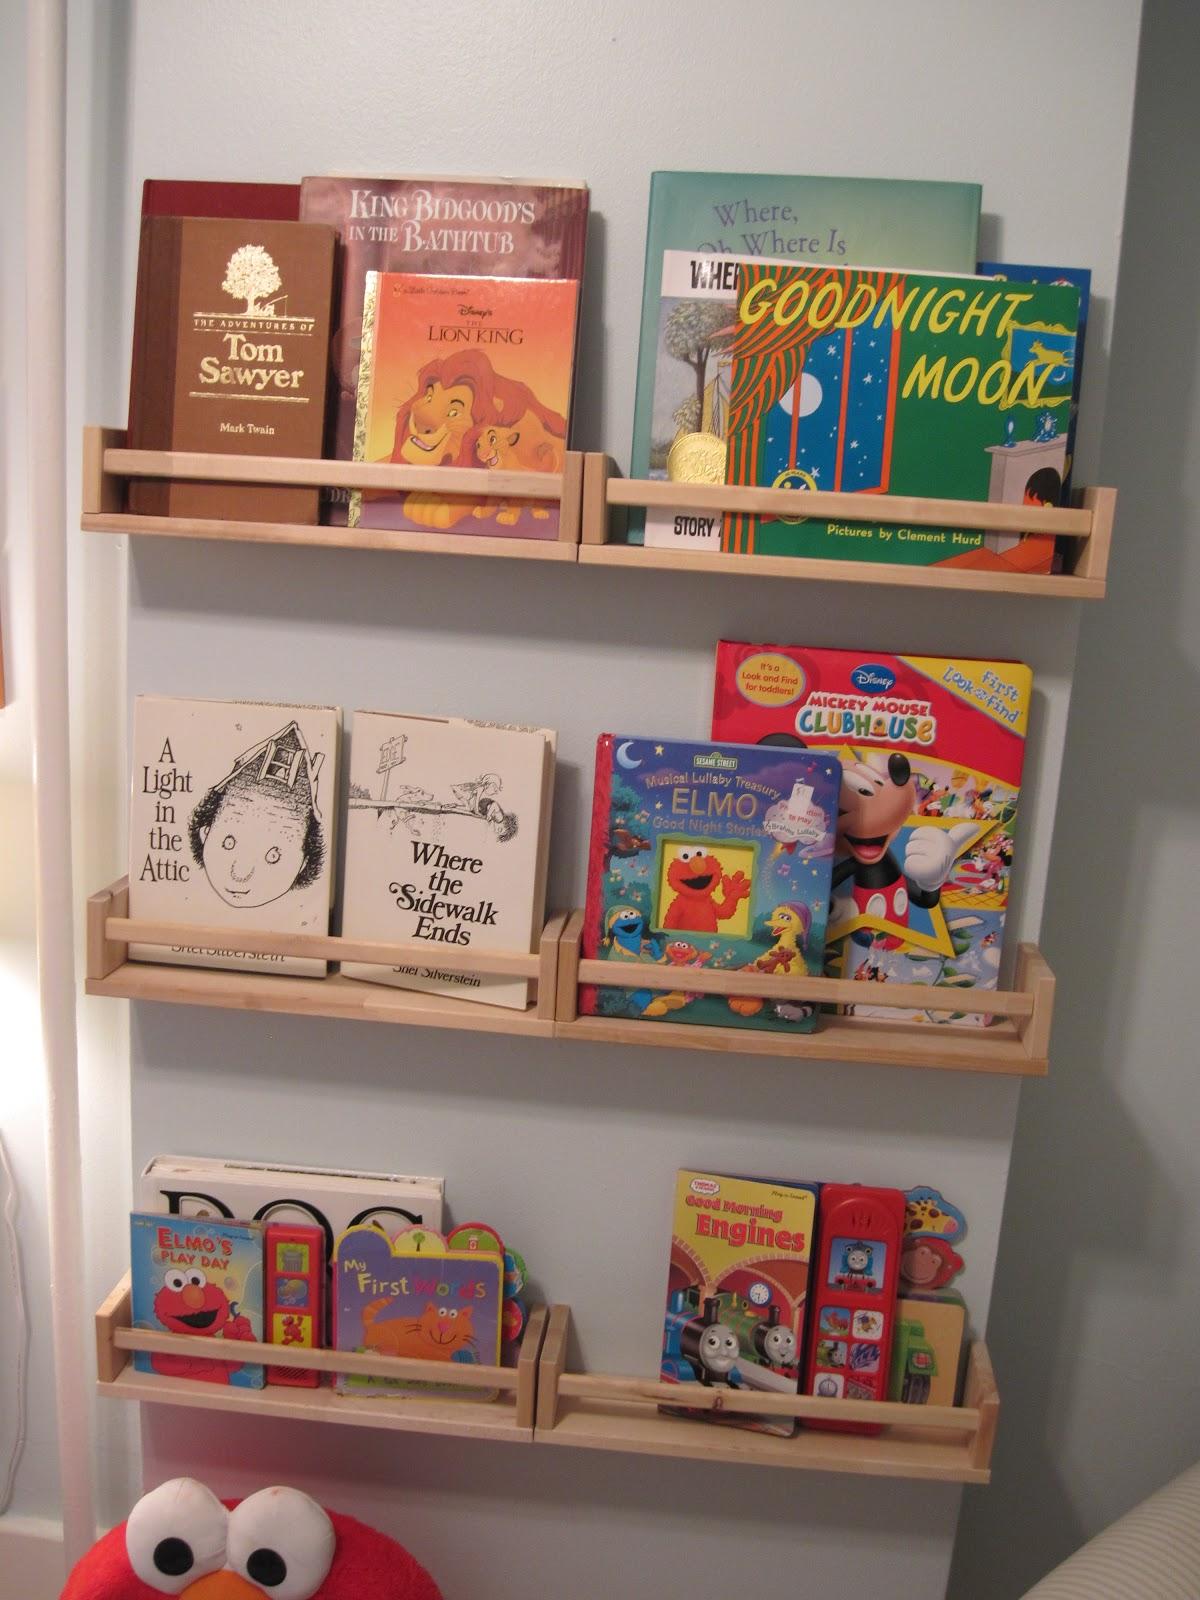 Our Old Abode Ikea Spice Racks As Bookshelves